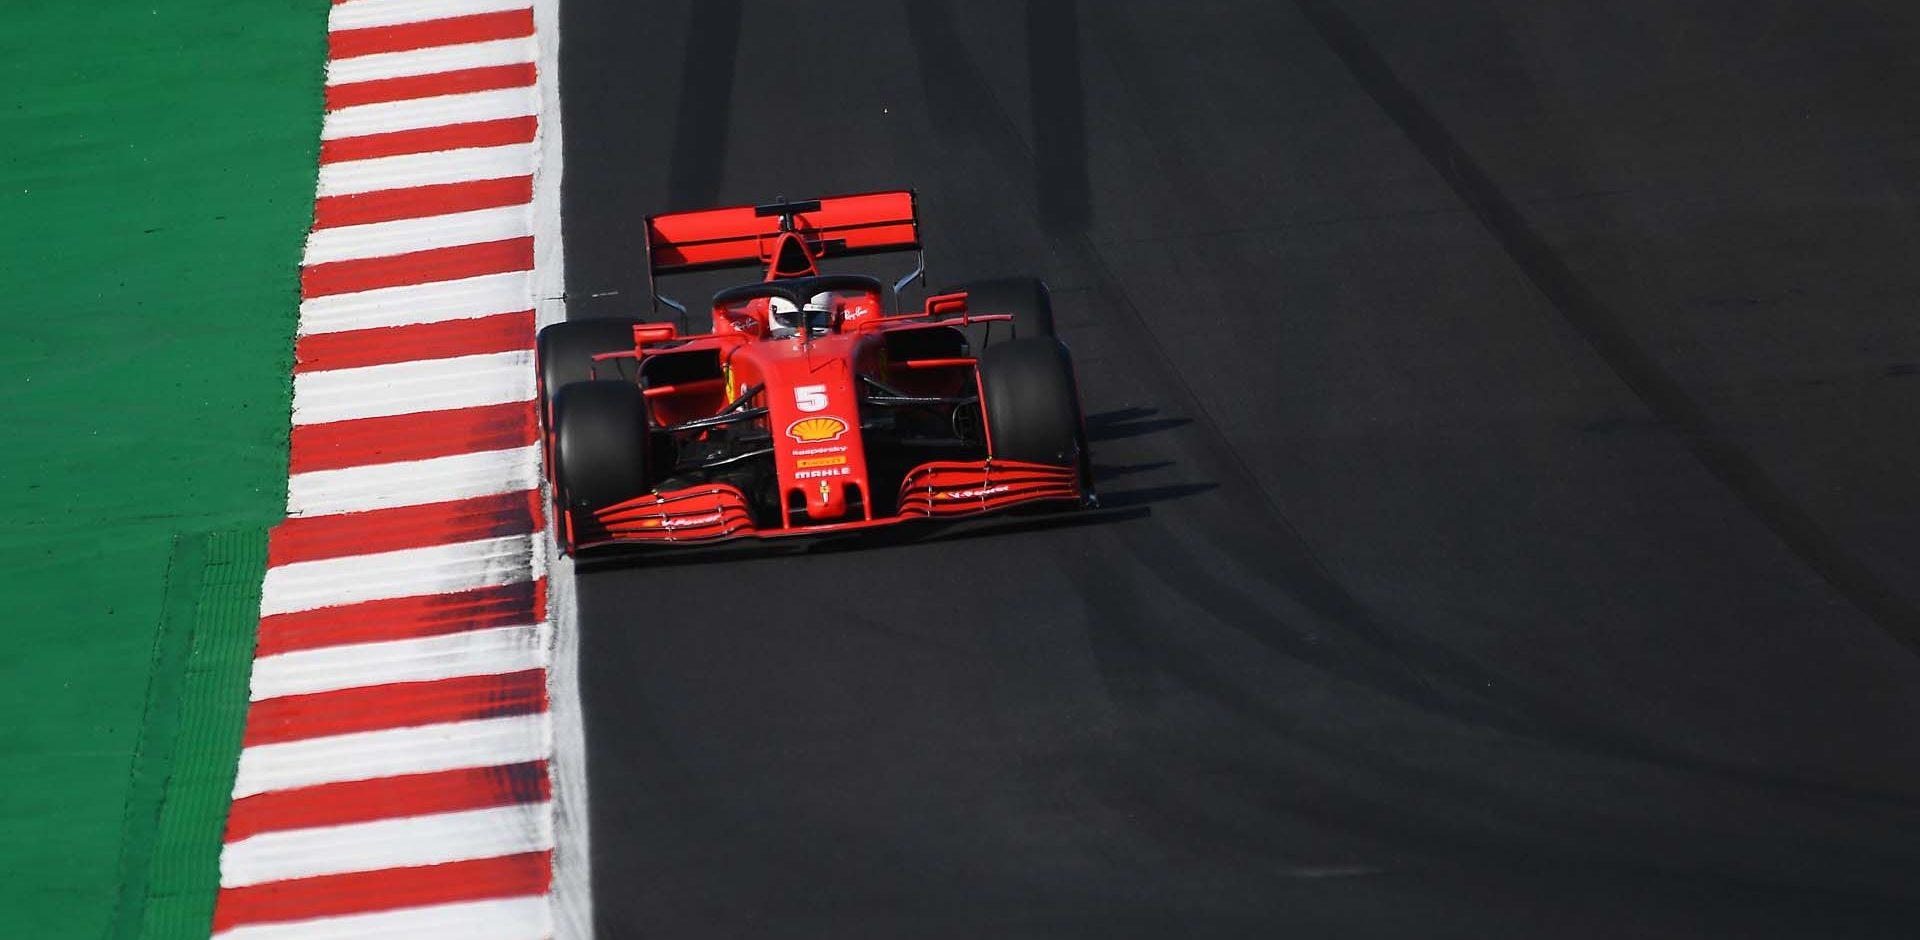 GP PORTOGALLO F1/2020 -  SABATO 24/10/2020  Sebastian Vettel  credit: @Scuderia Ferrari Press Office Sebastian Vettel